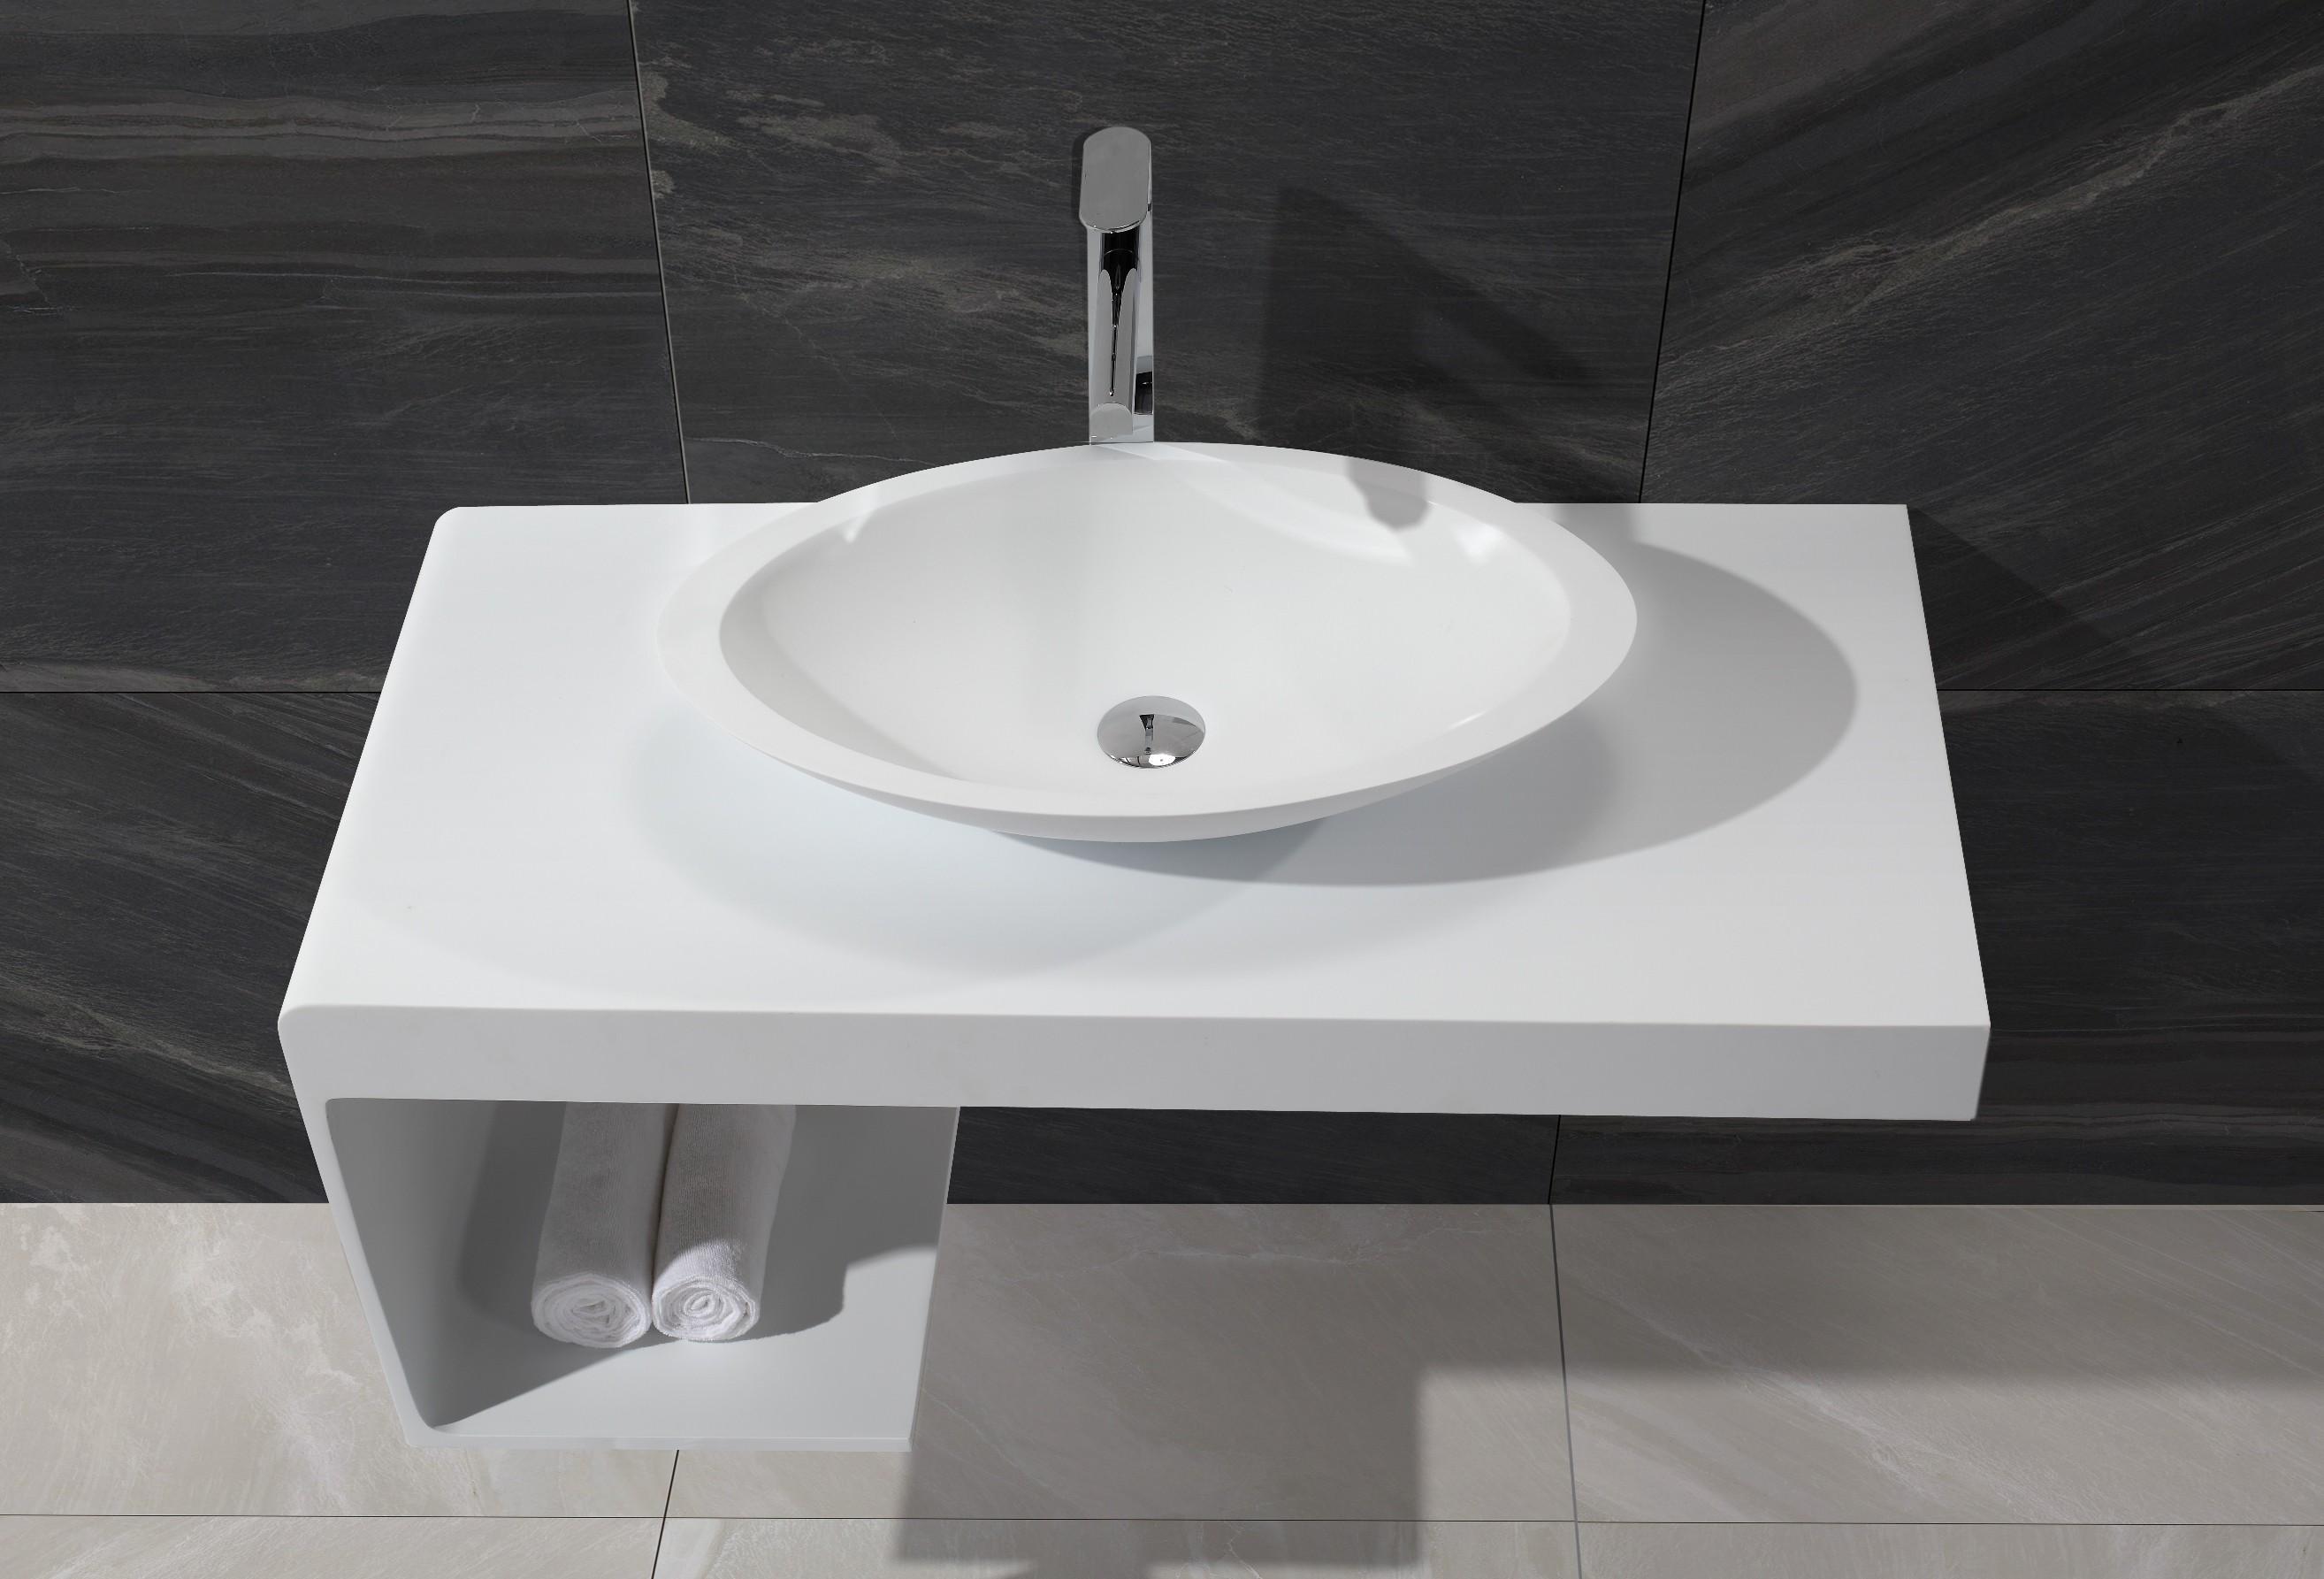 Design waschtischplatte 1396 badewelt badezimmer m bel for Badezimmer waschtisch set